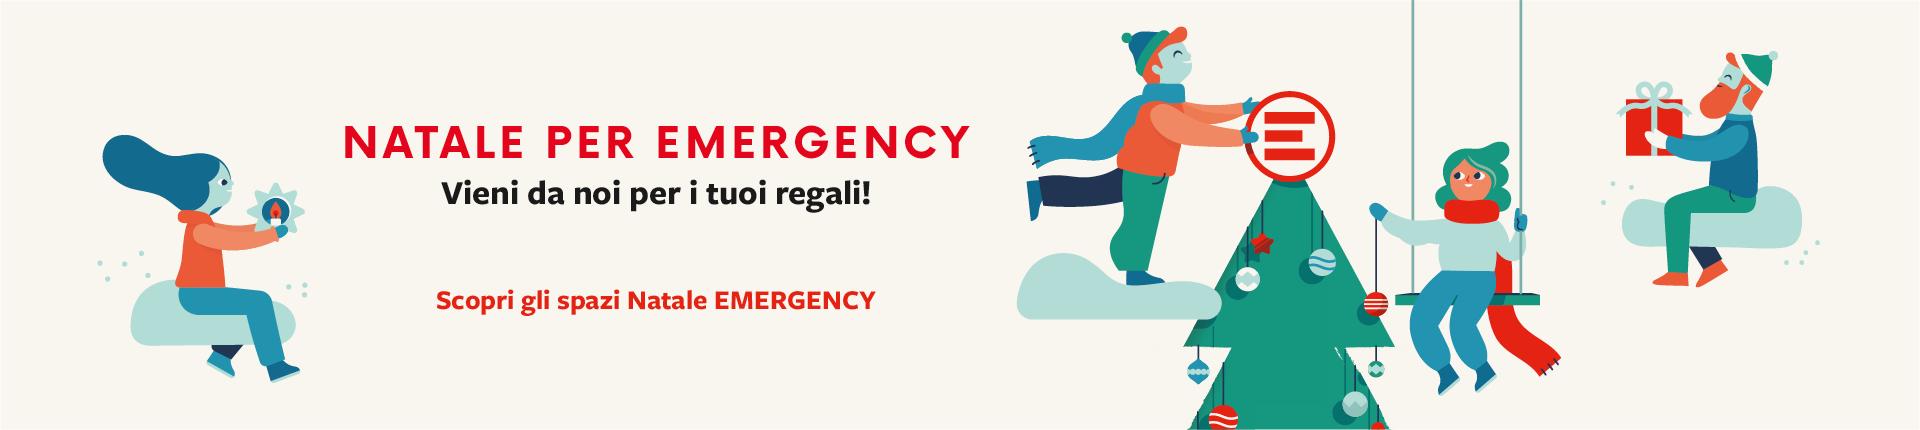 Emergency Regali Di Natale.Spazio Natale 2018 All Infopoint Emergency Radio Elettrica